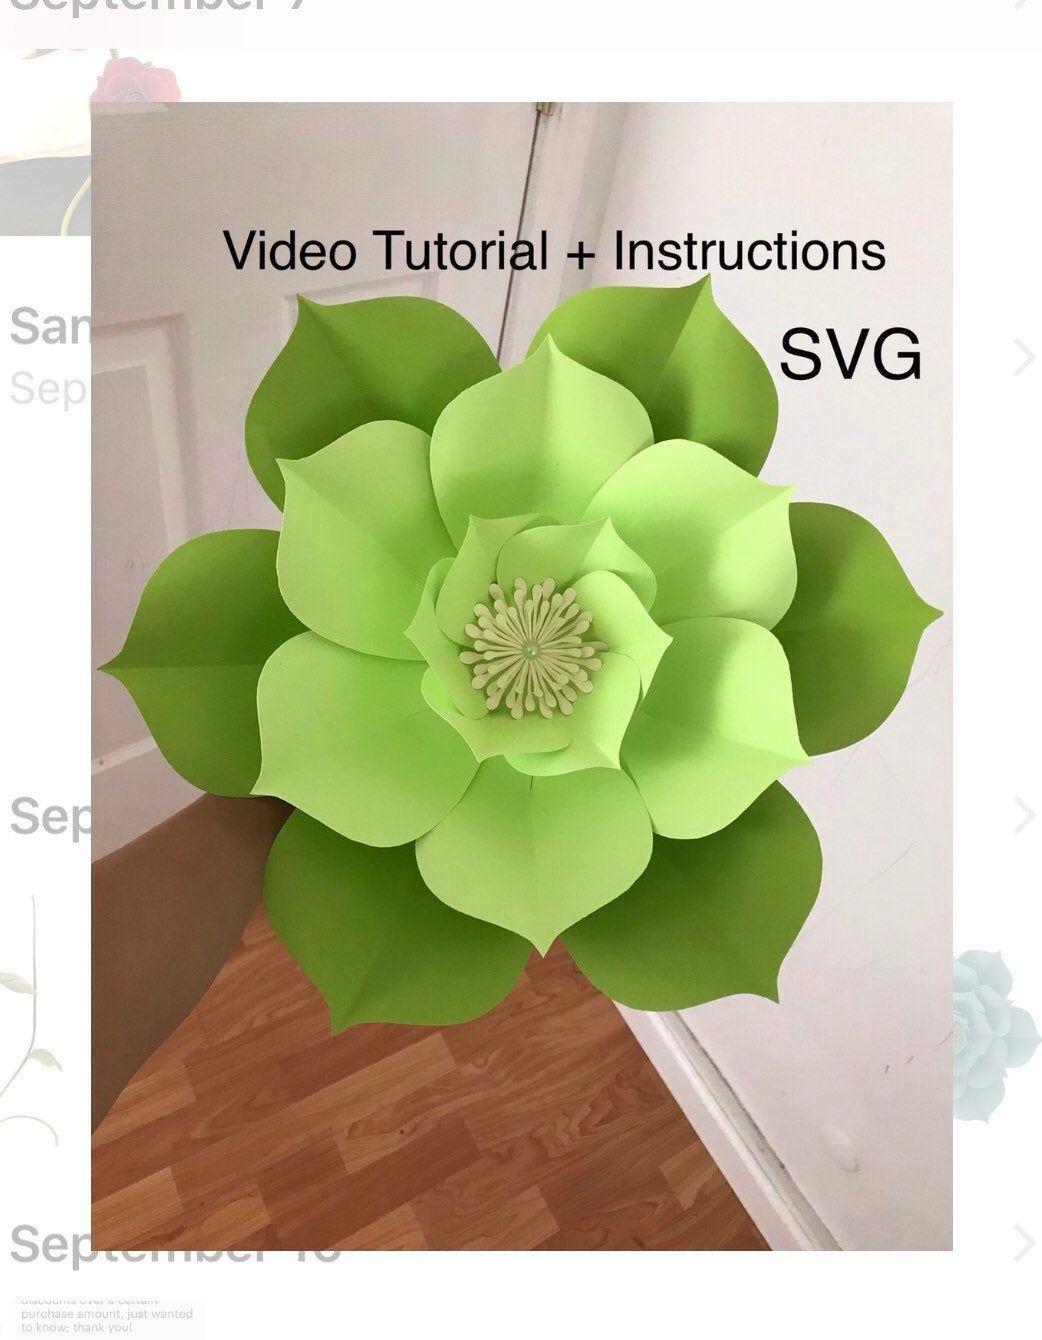 Paper Flower Template SVG 3D Flower Svg Paper Flowers Svg Flower Svg Files Large Paper Flowers Template Svg Giant Paper Flowers #easypaperflowers